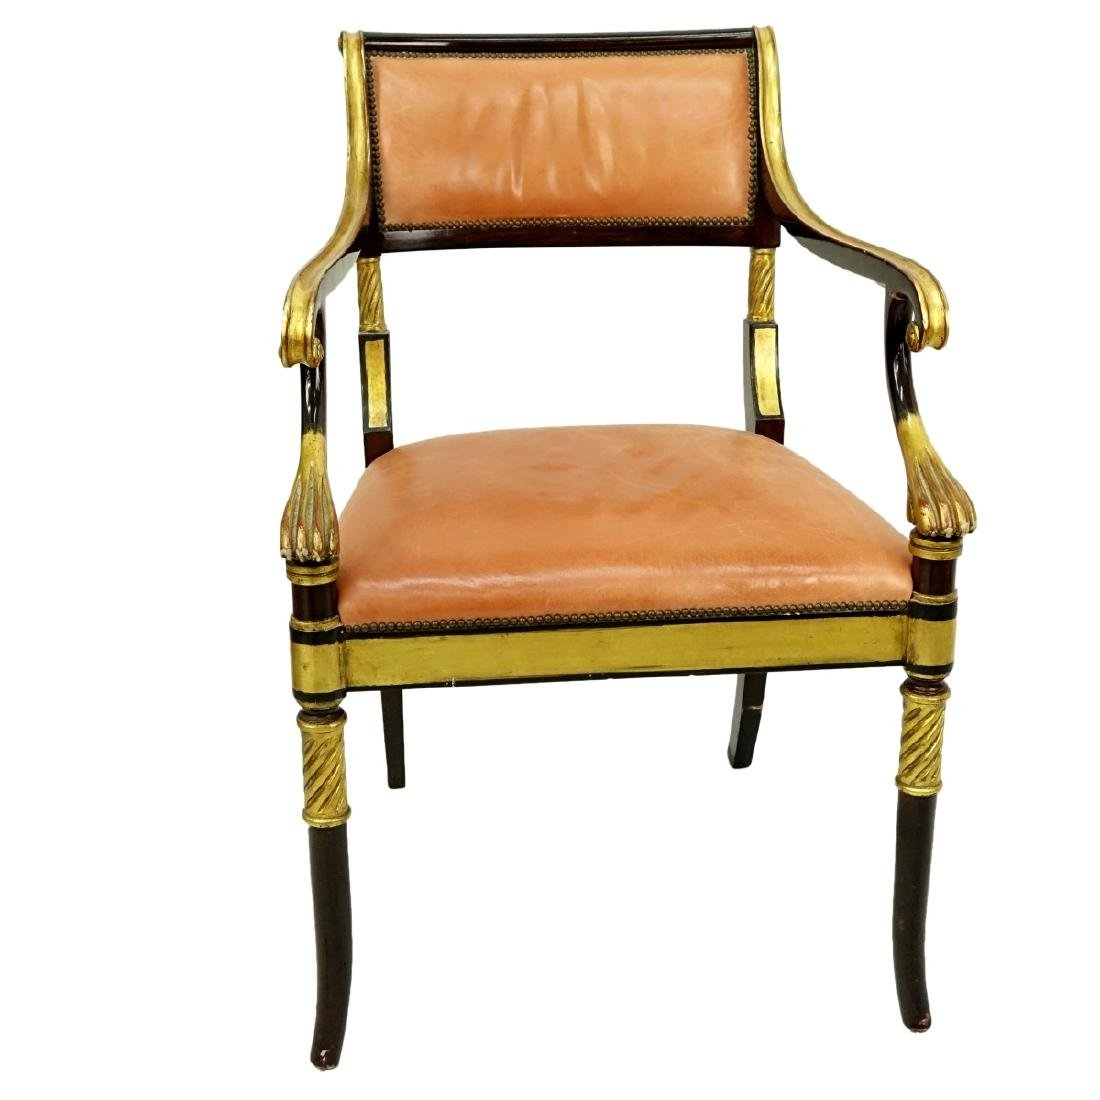 Regency style Arm Chair - 2